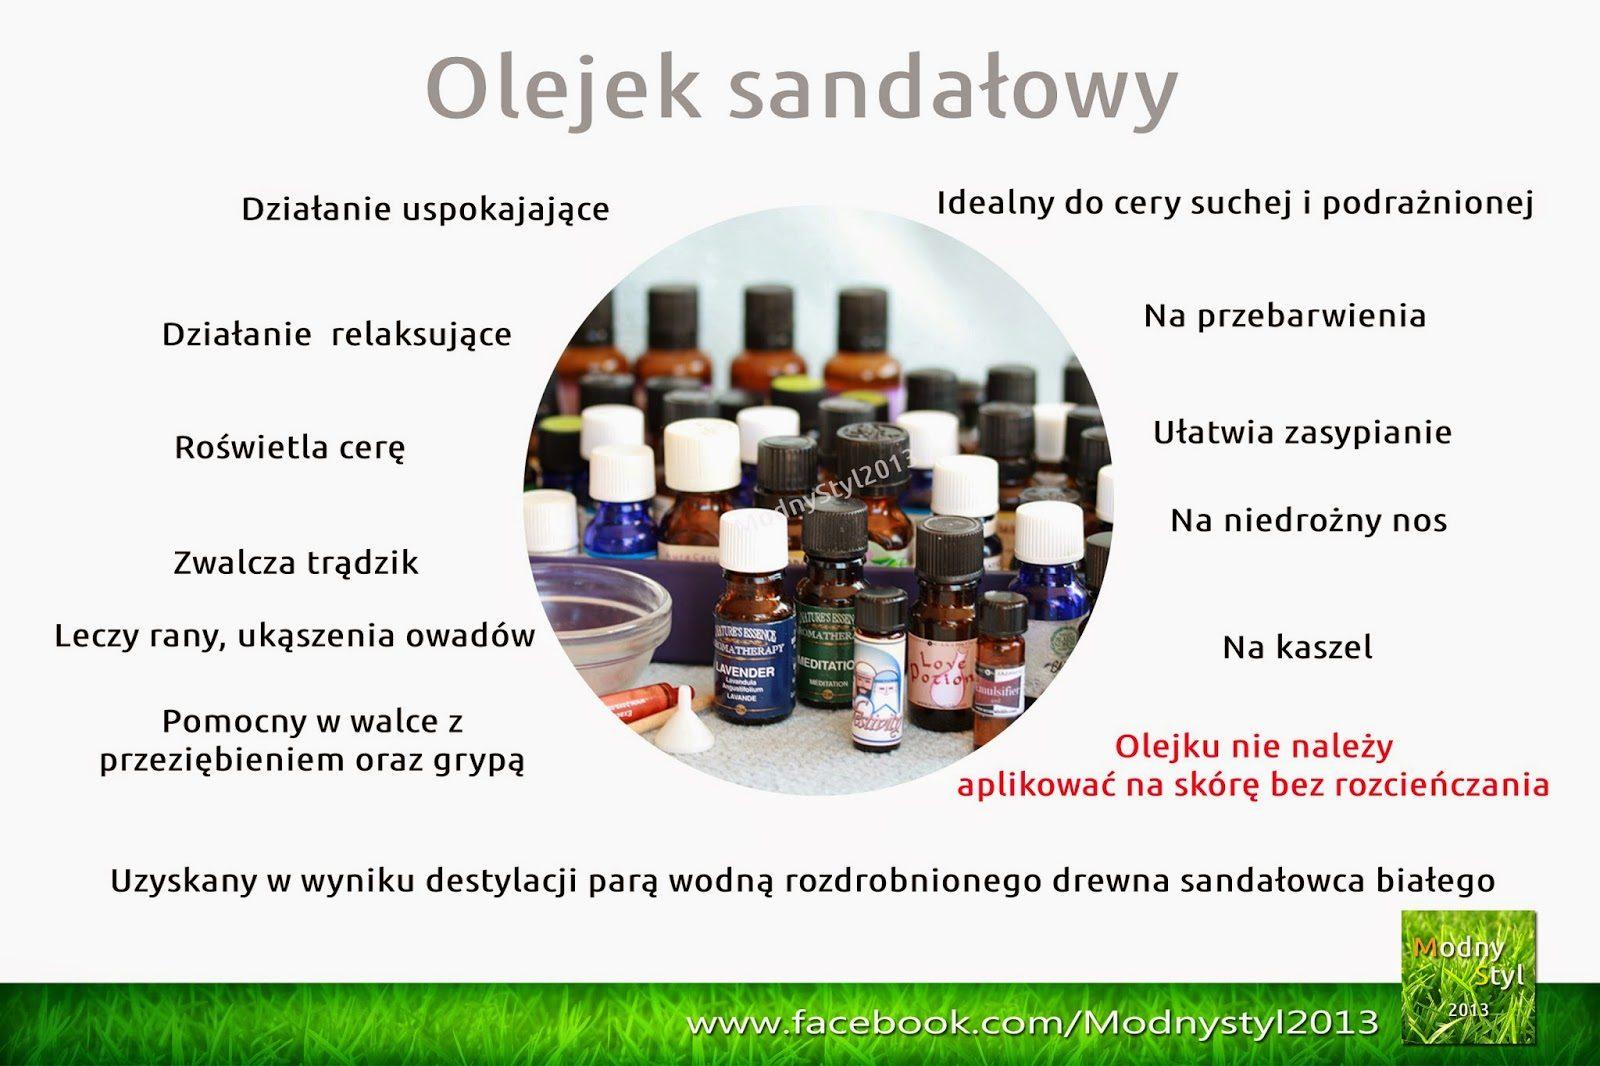 sandals2boil-6799235